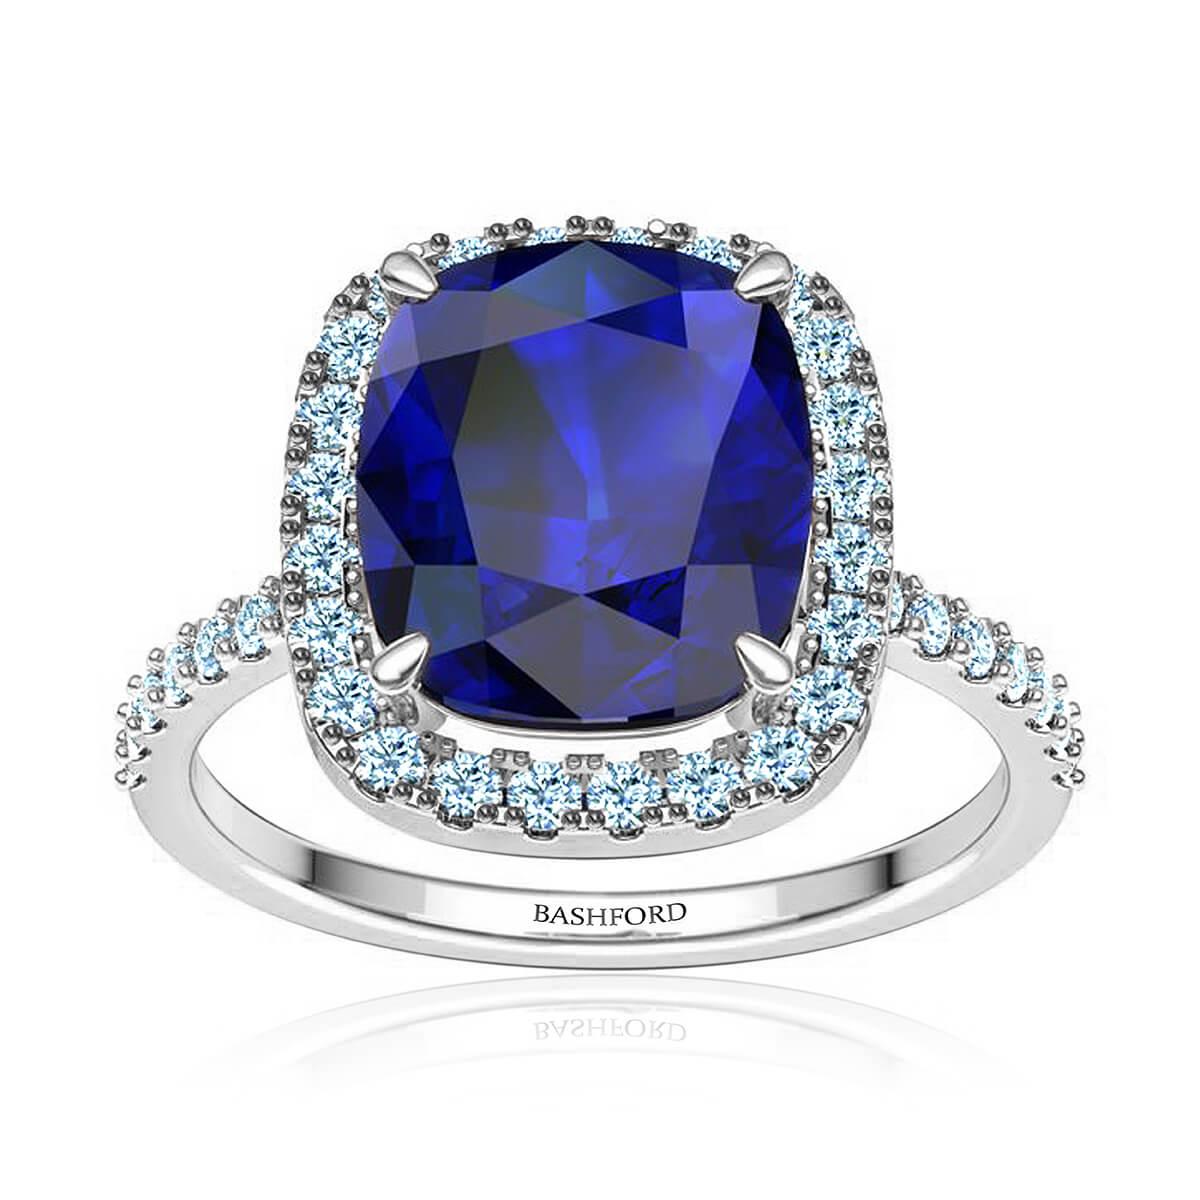 Gloria Sapphire Ring (with 8 x 6 Cushion Blue Sapphire)